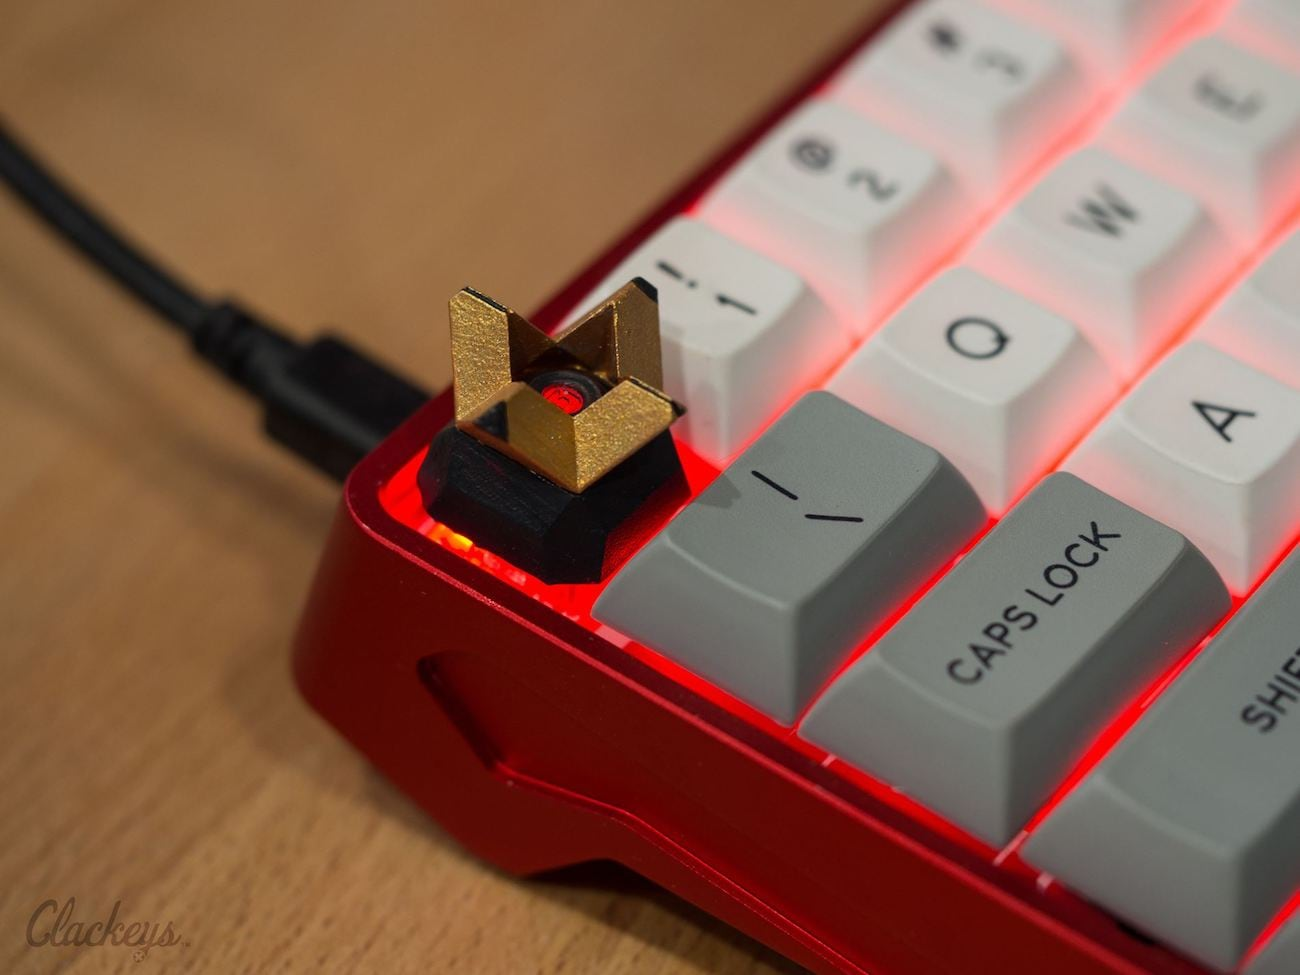 Clackeys Custom Designed Keycaps